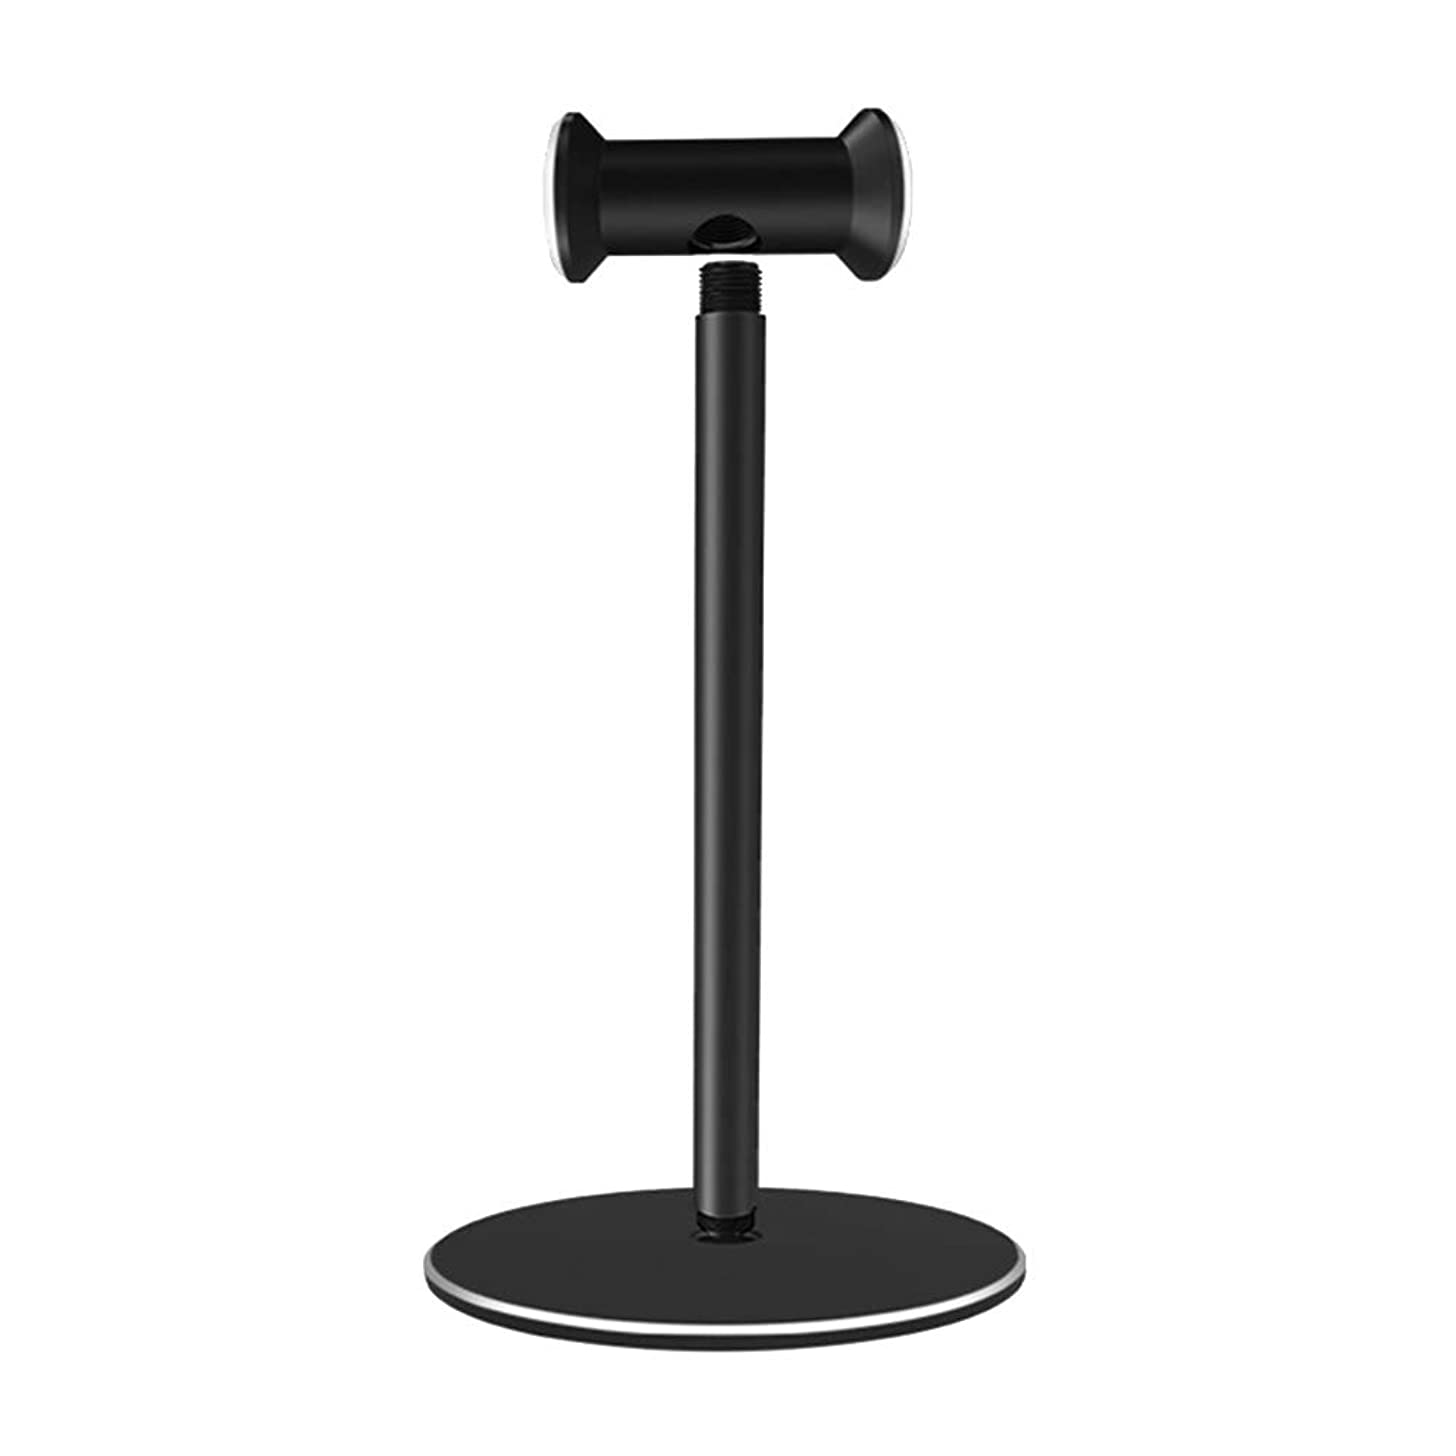 SuBoZhuLiuJ Headset Holder,Aluminium Alloy Headset Stand Holder Desktop Headphone Display Rack Organizer - Black